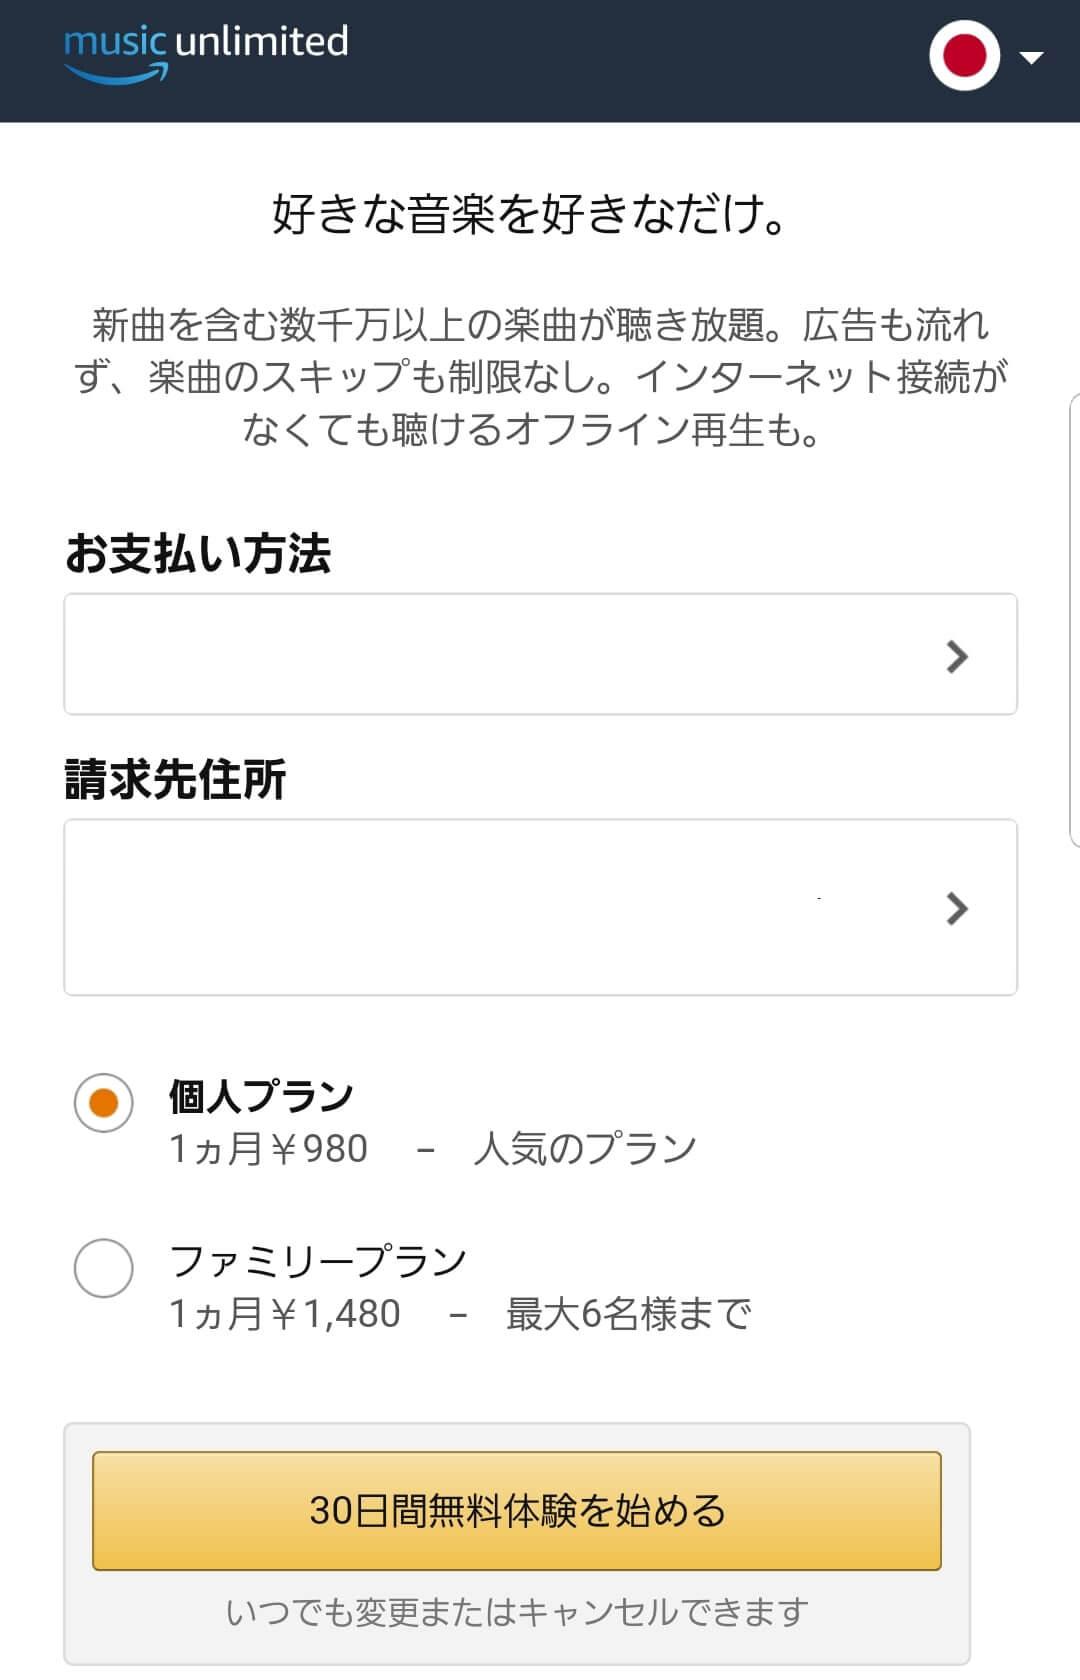 Amazon Music Unlimited 30日間無料体験の手順